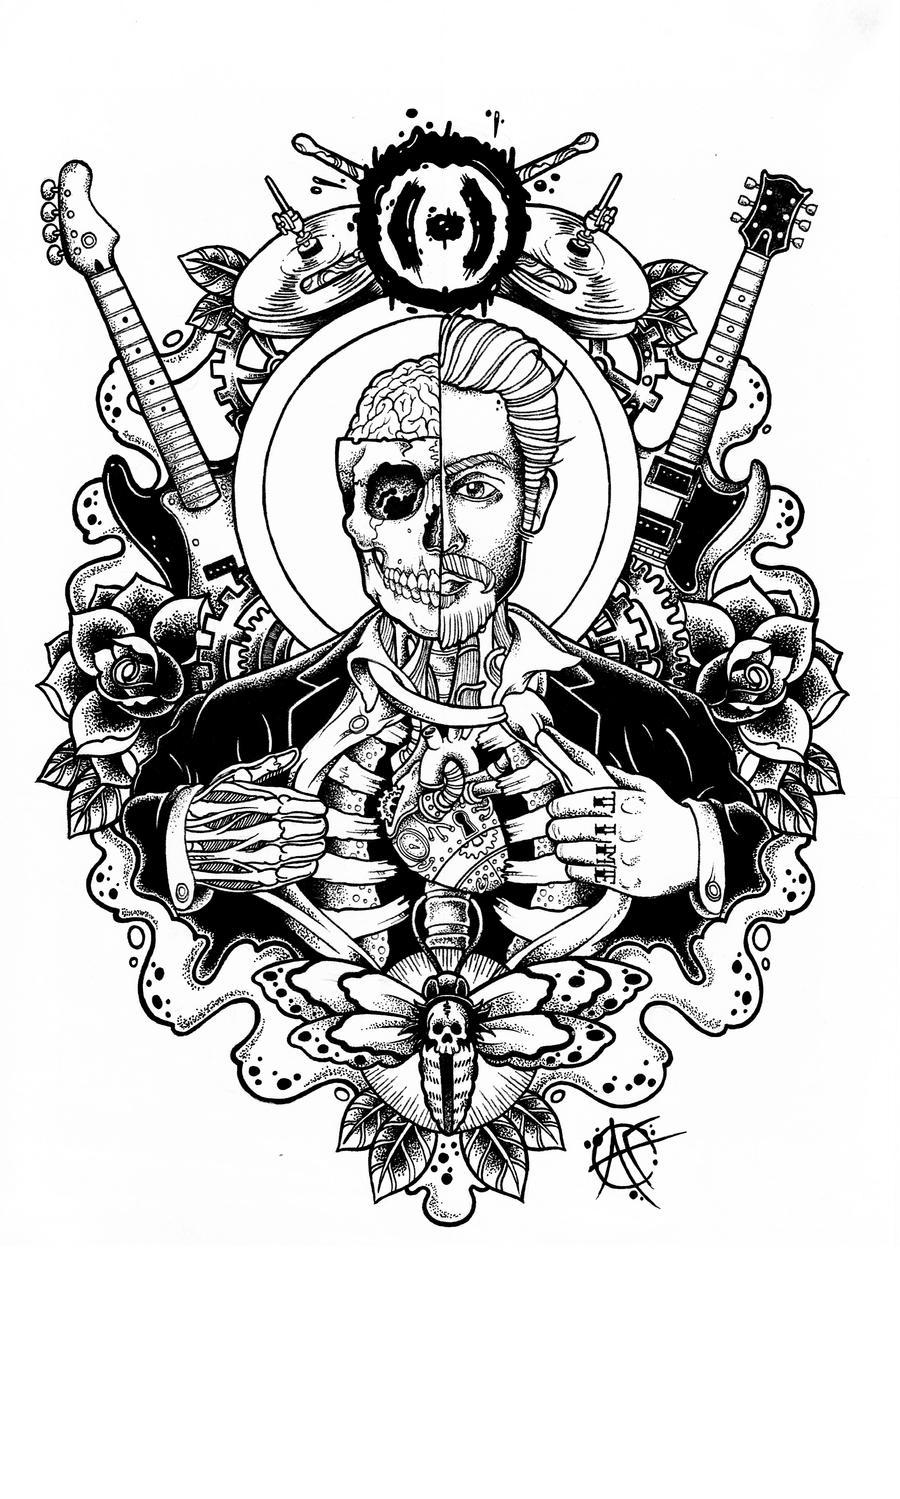 Design t shirt art - Commission Tshirt Design By Frosttattoo Commission Tshirt Design By Frosttattoo